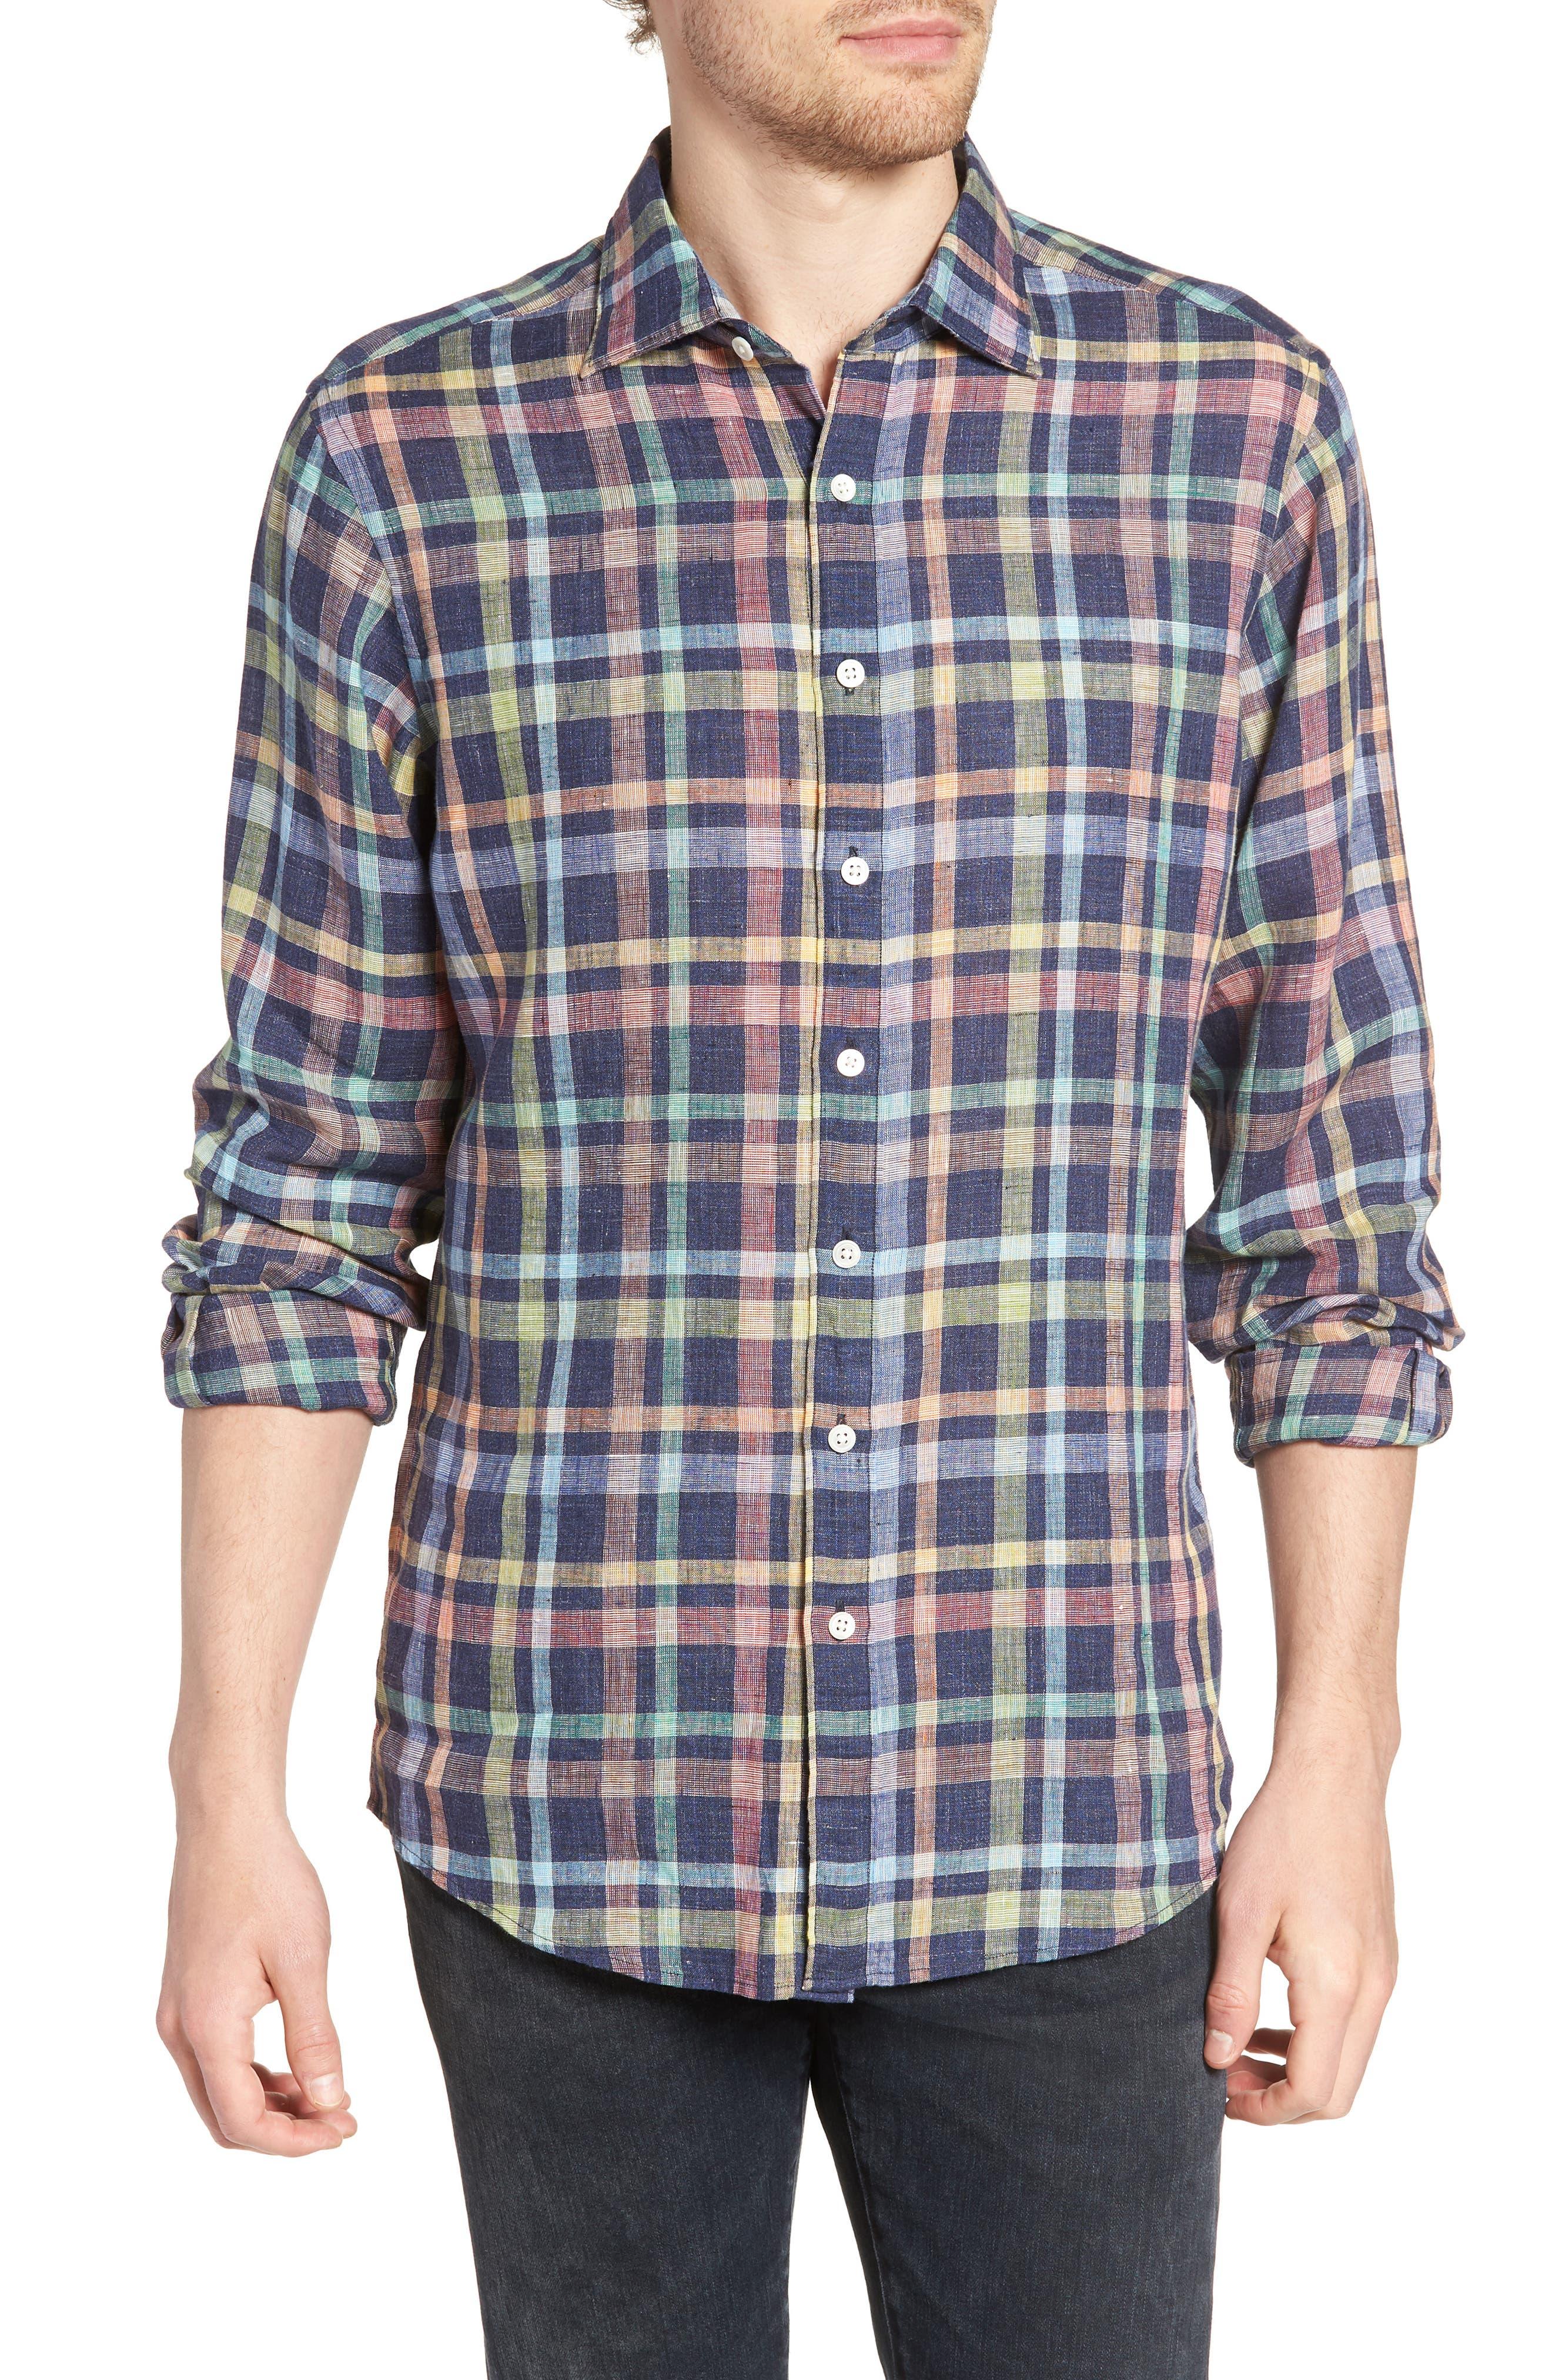 Image of RODD AND GUNN Stirling Plaid Linen Sport Shirt